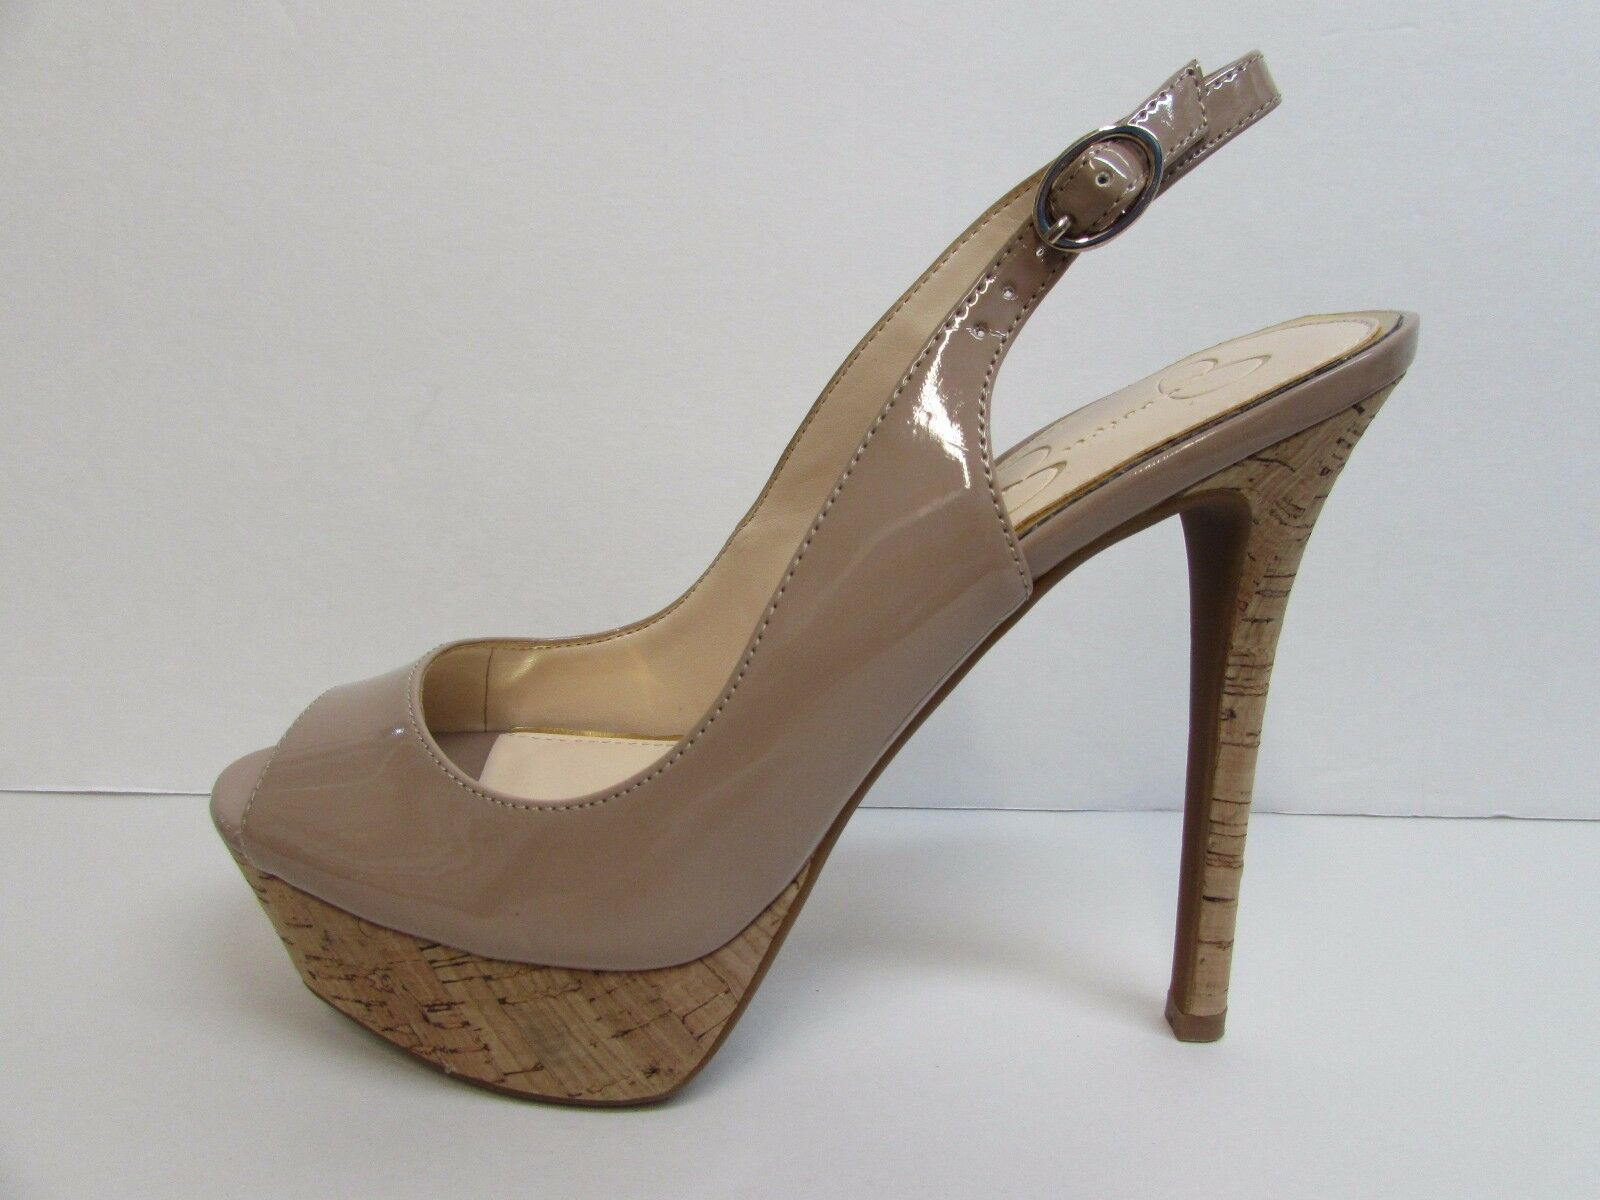 Jessica Schuhes Simpson Größe 10 Biege Platform Heels New Damenschuhe Schuhes Jessica 7a5208